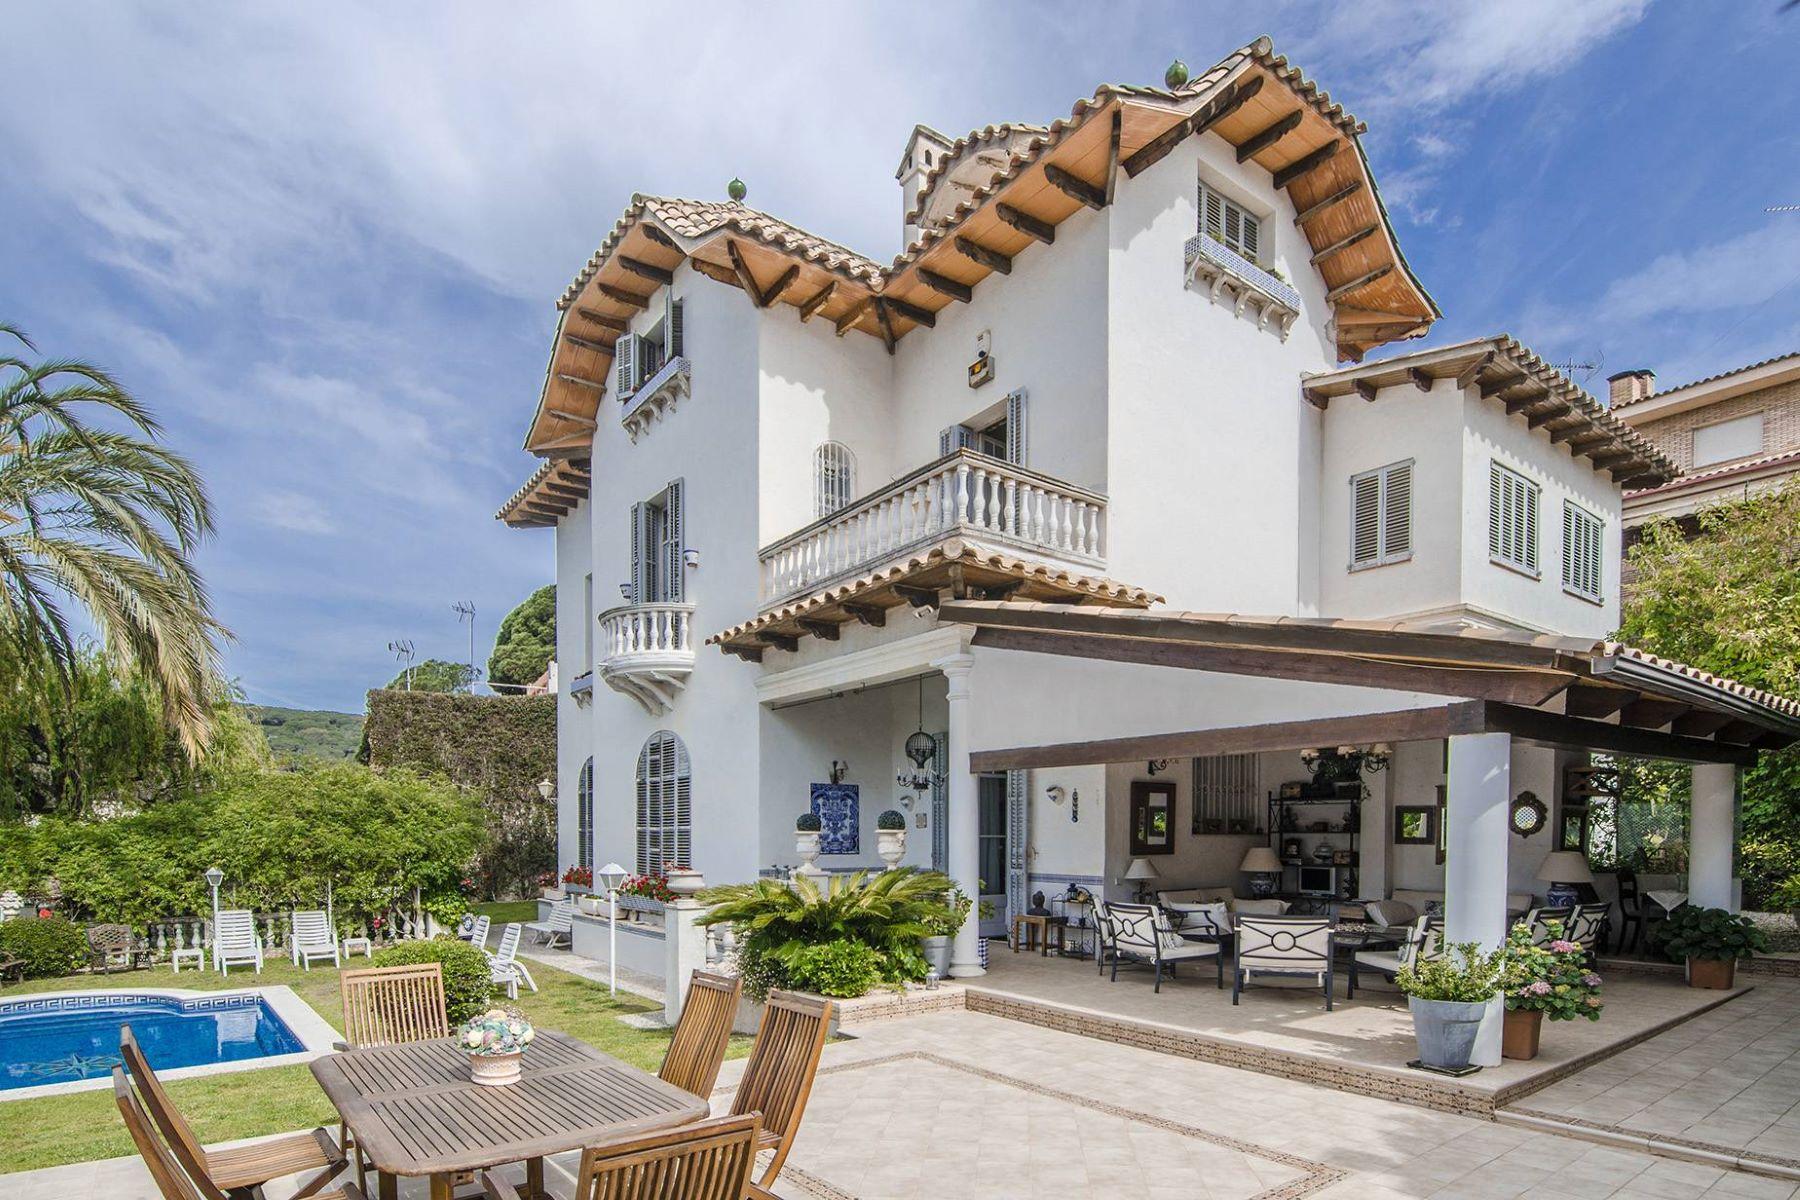 Single Family Home for Sale at Majestic Mansion with a Modernist Soul in LLavaneras Sant Andreu De Llavaneres, Barcelona, 08392 Spain